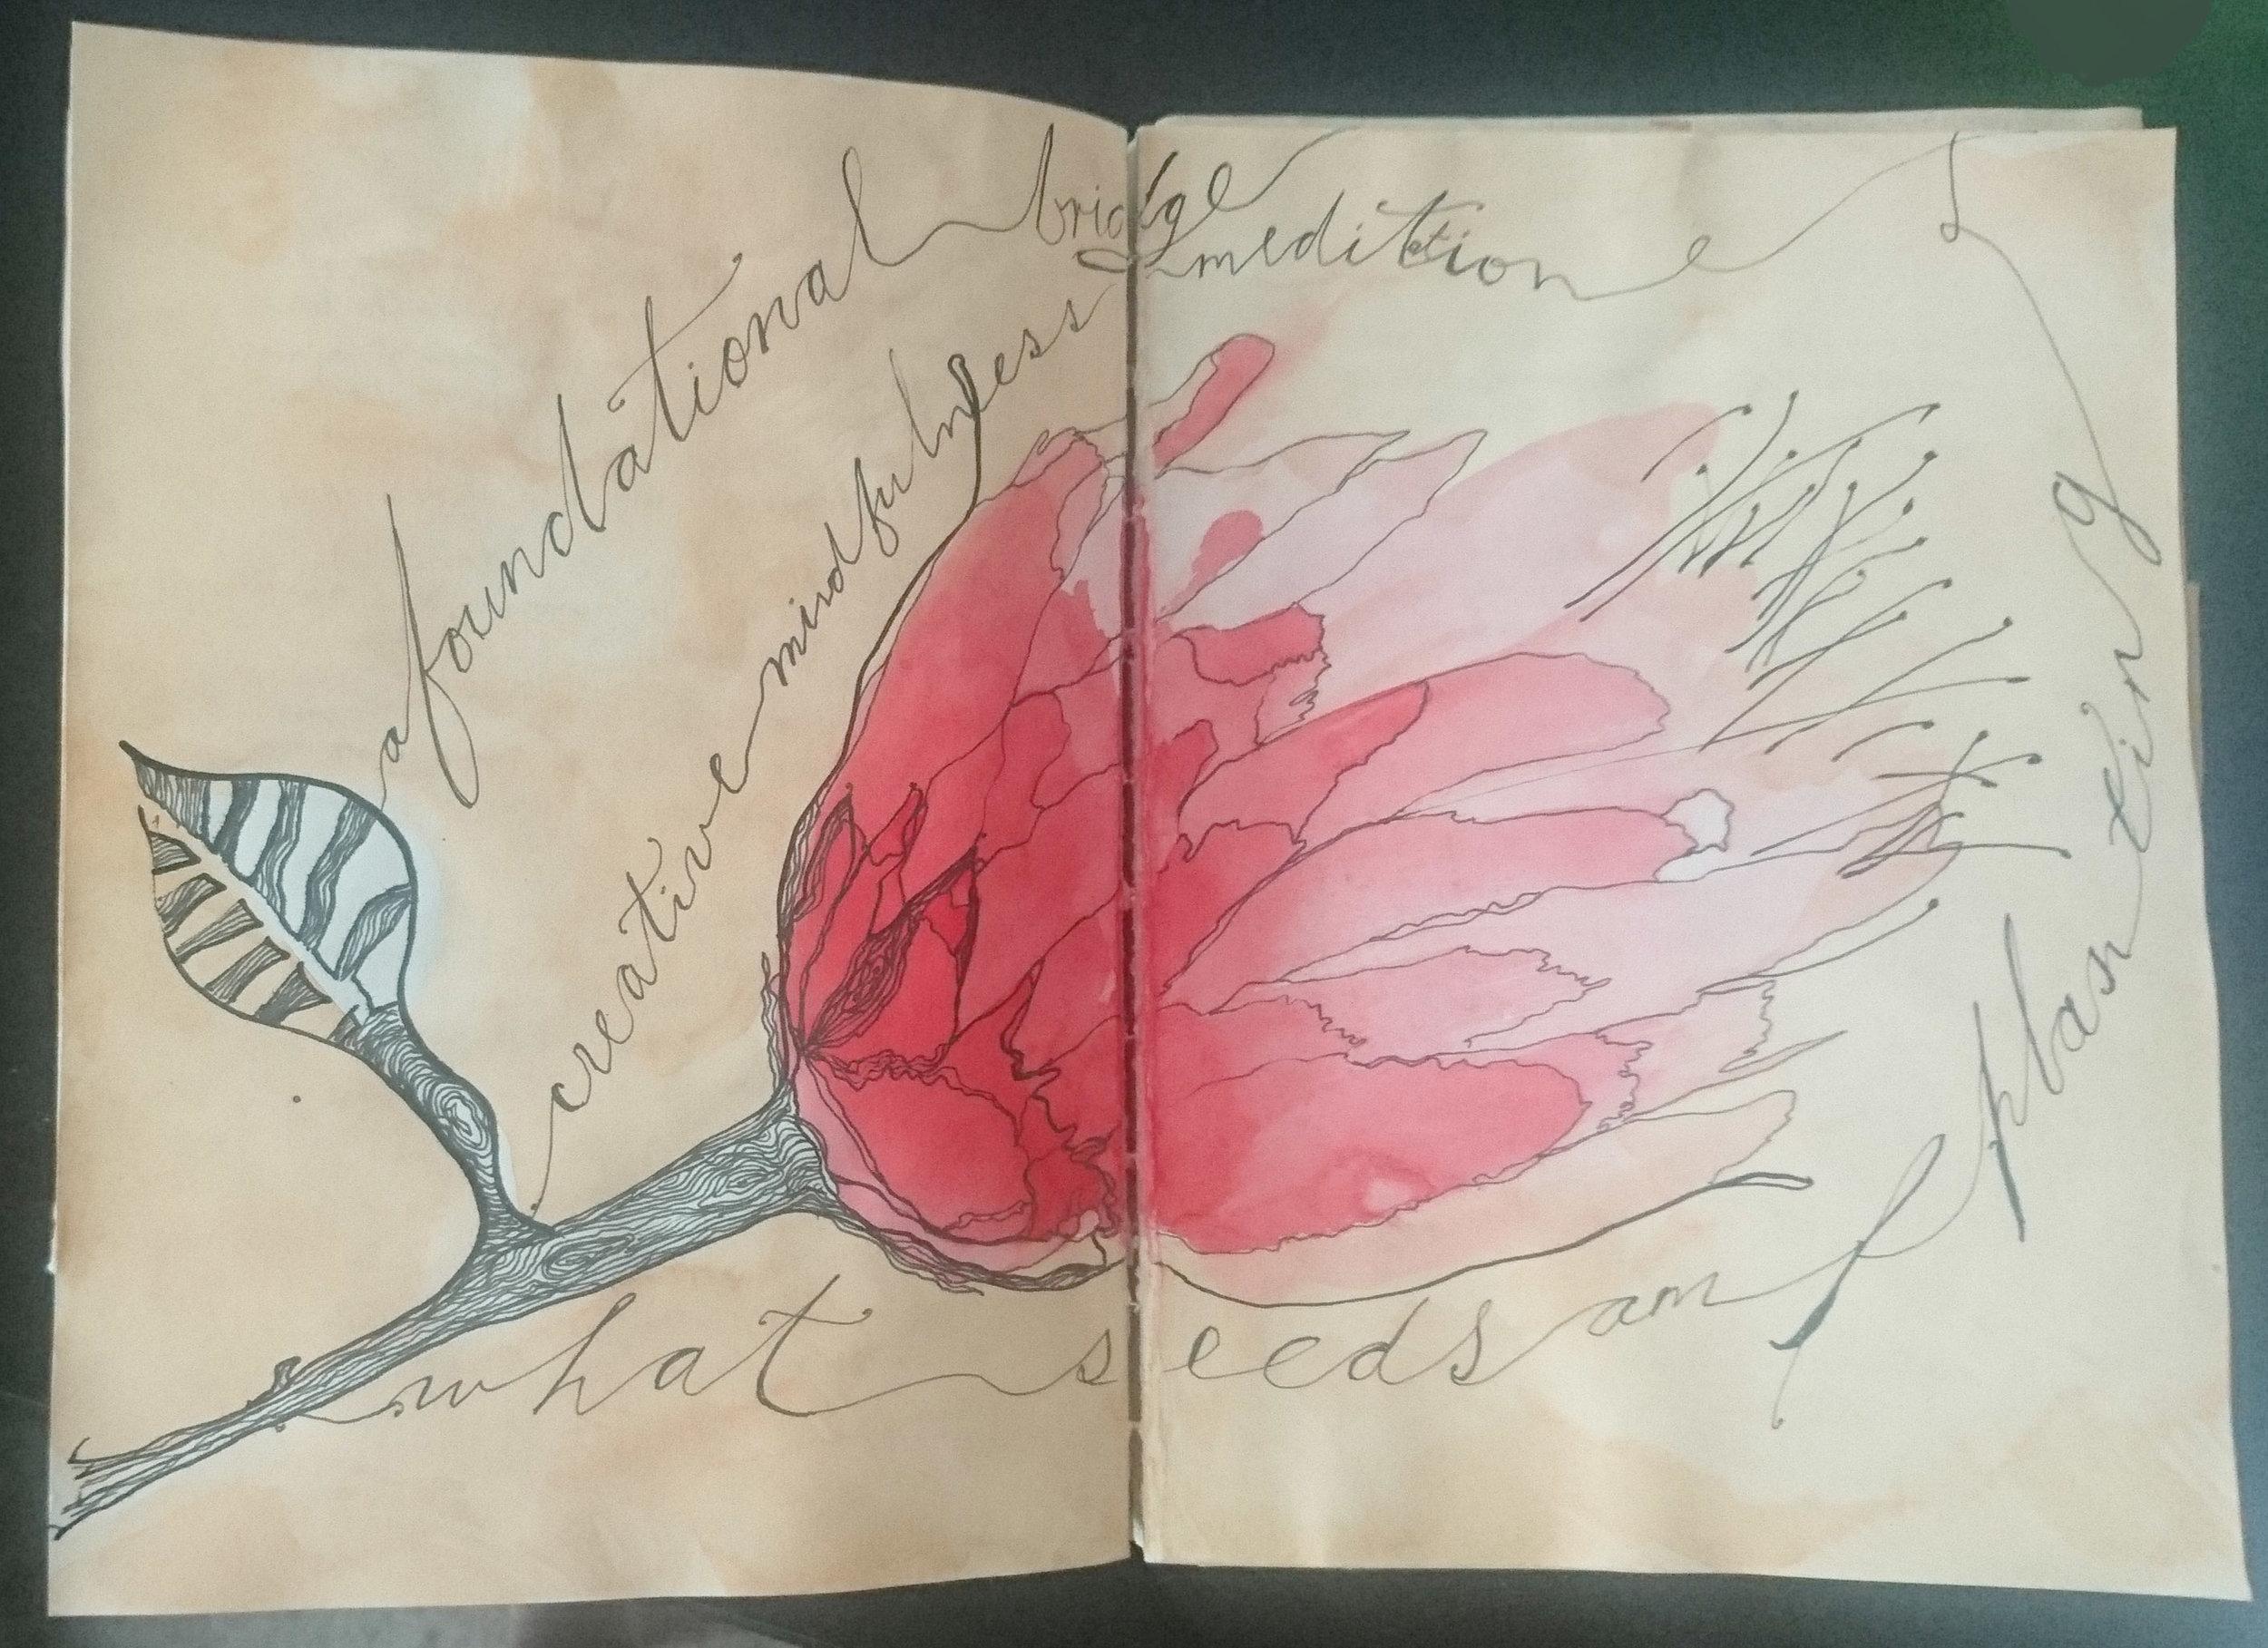 Image: Journal entry, Barbara Grace creativemindfulness.courses